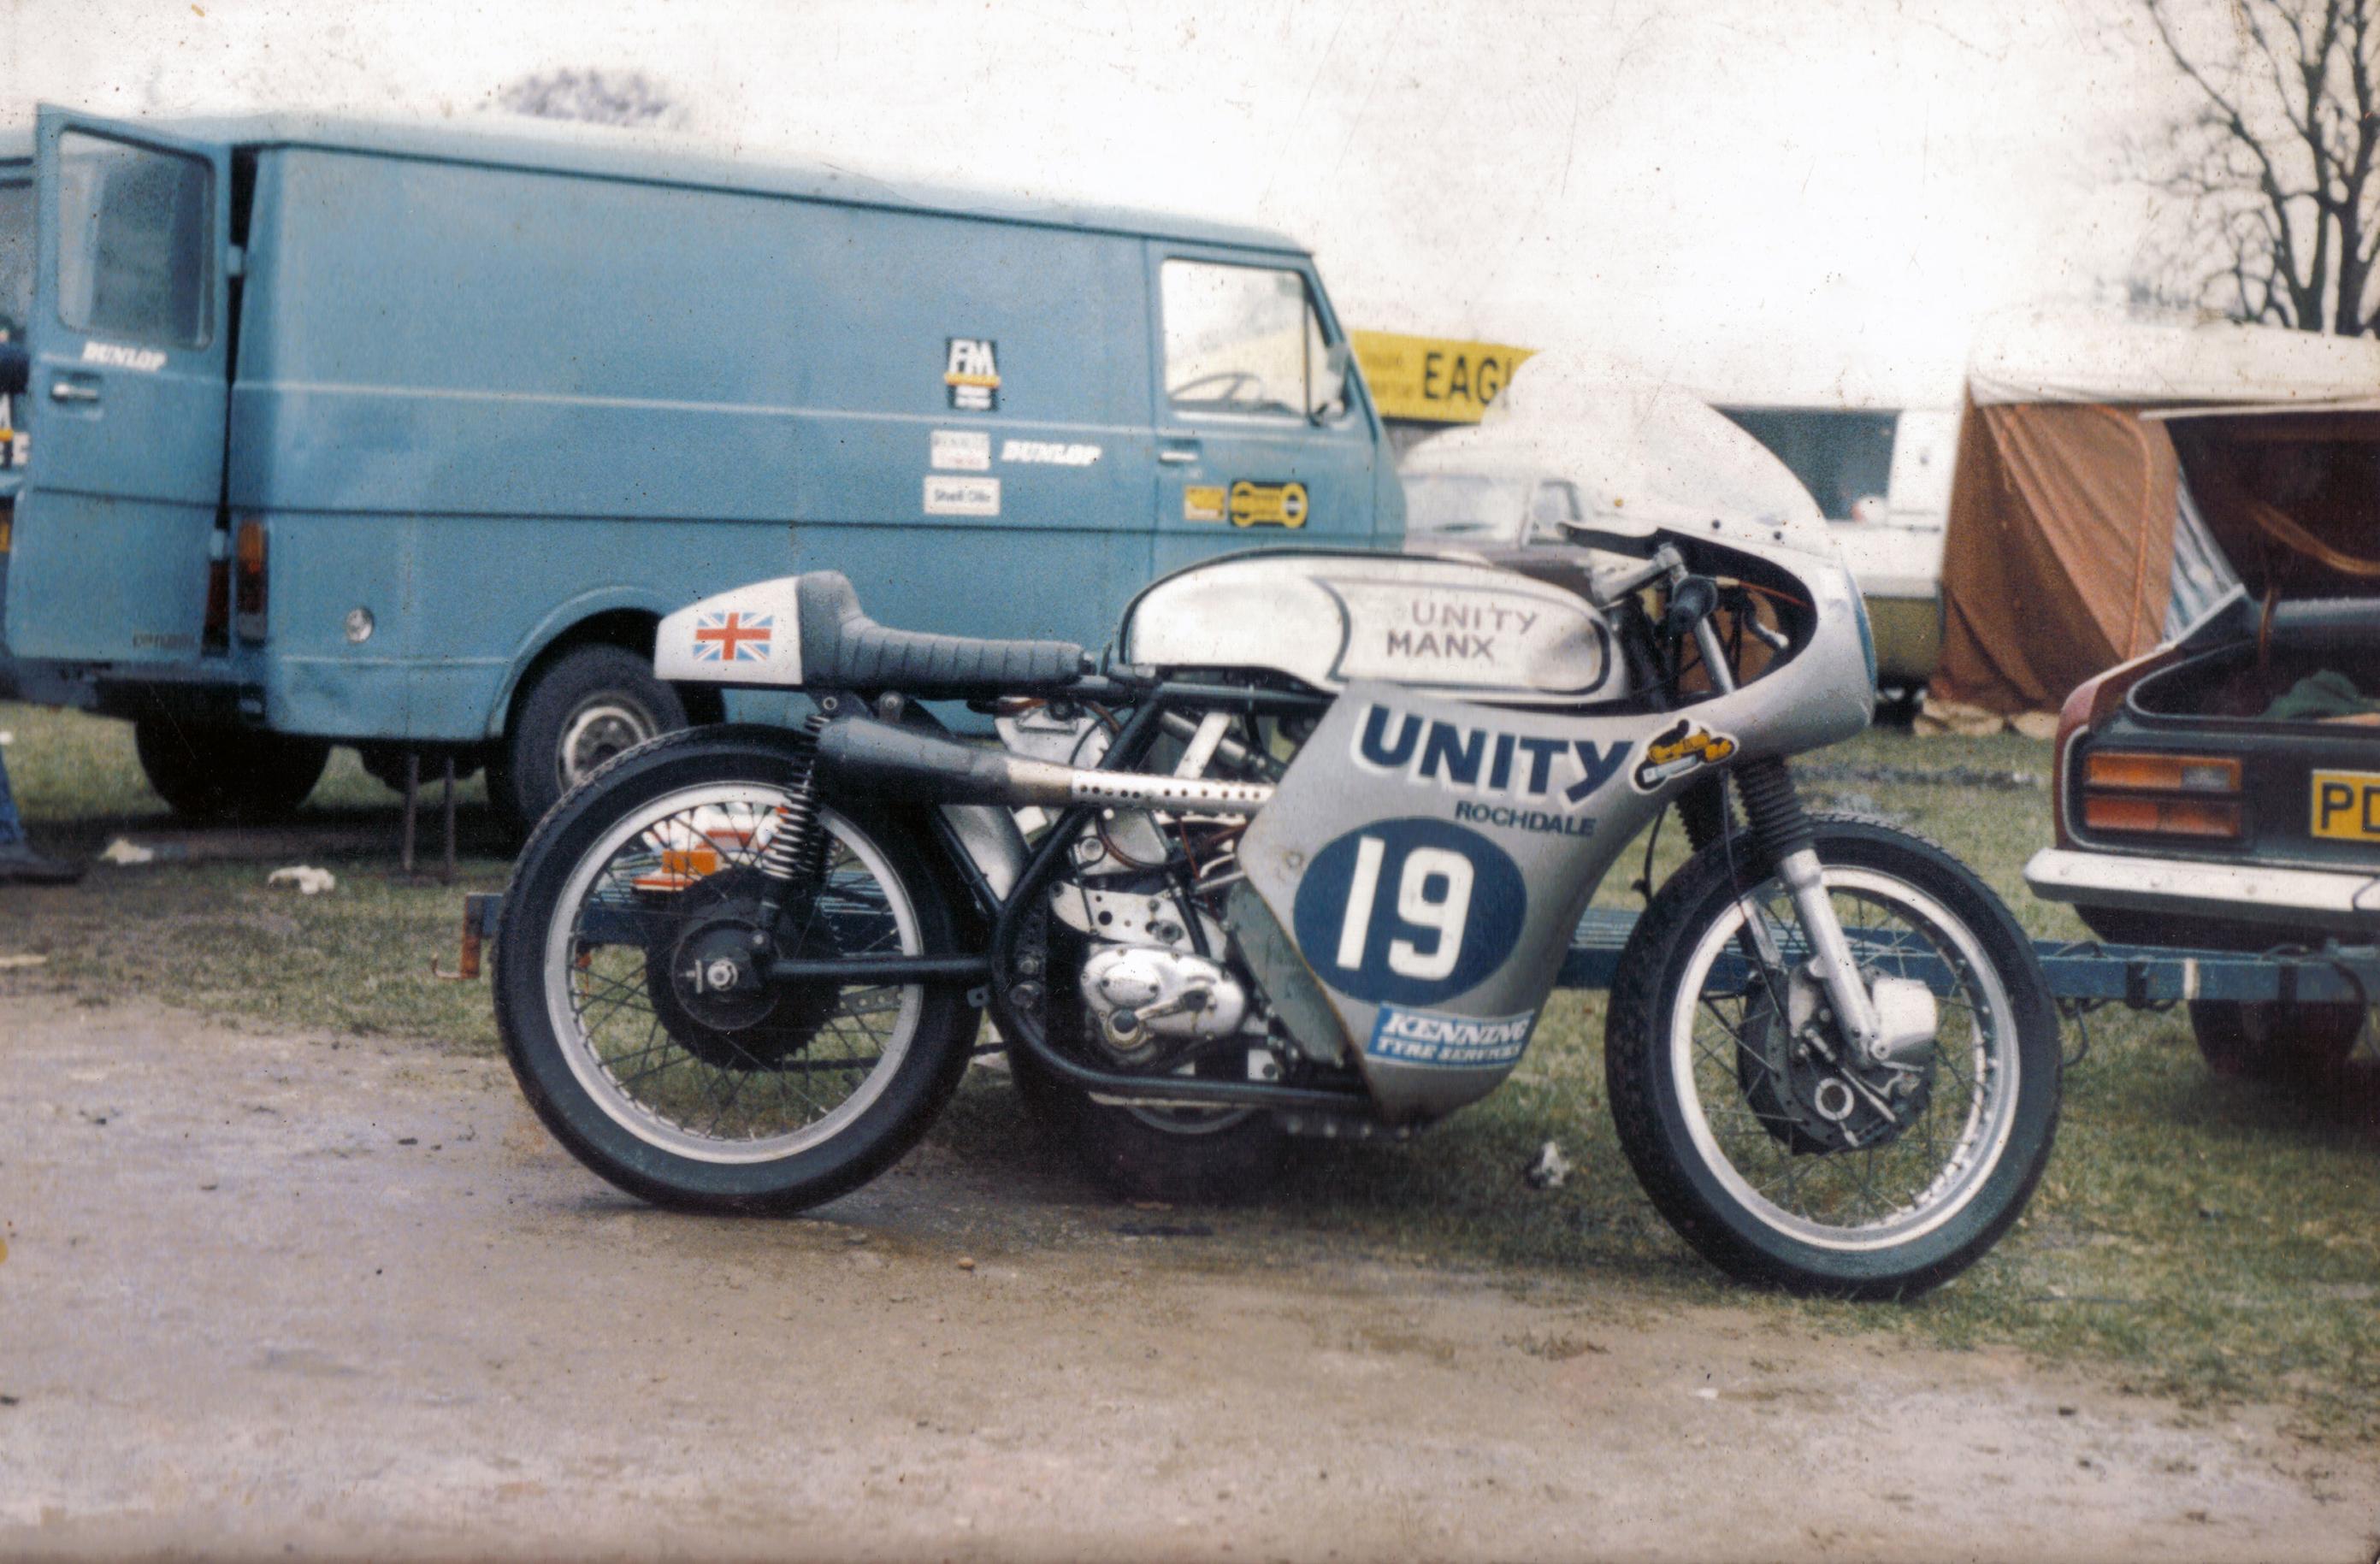 Ray's 350cc Unity/Tickle Manx